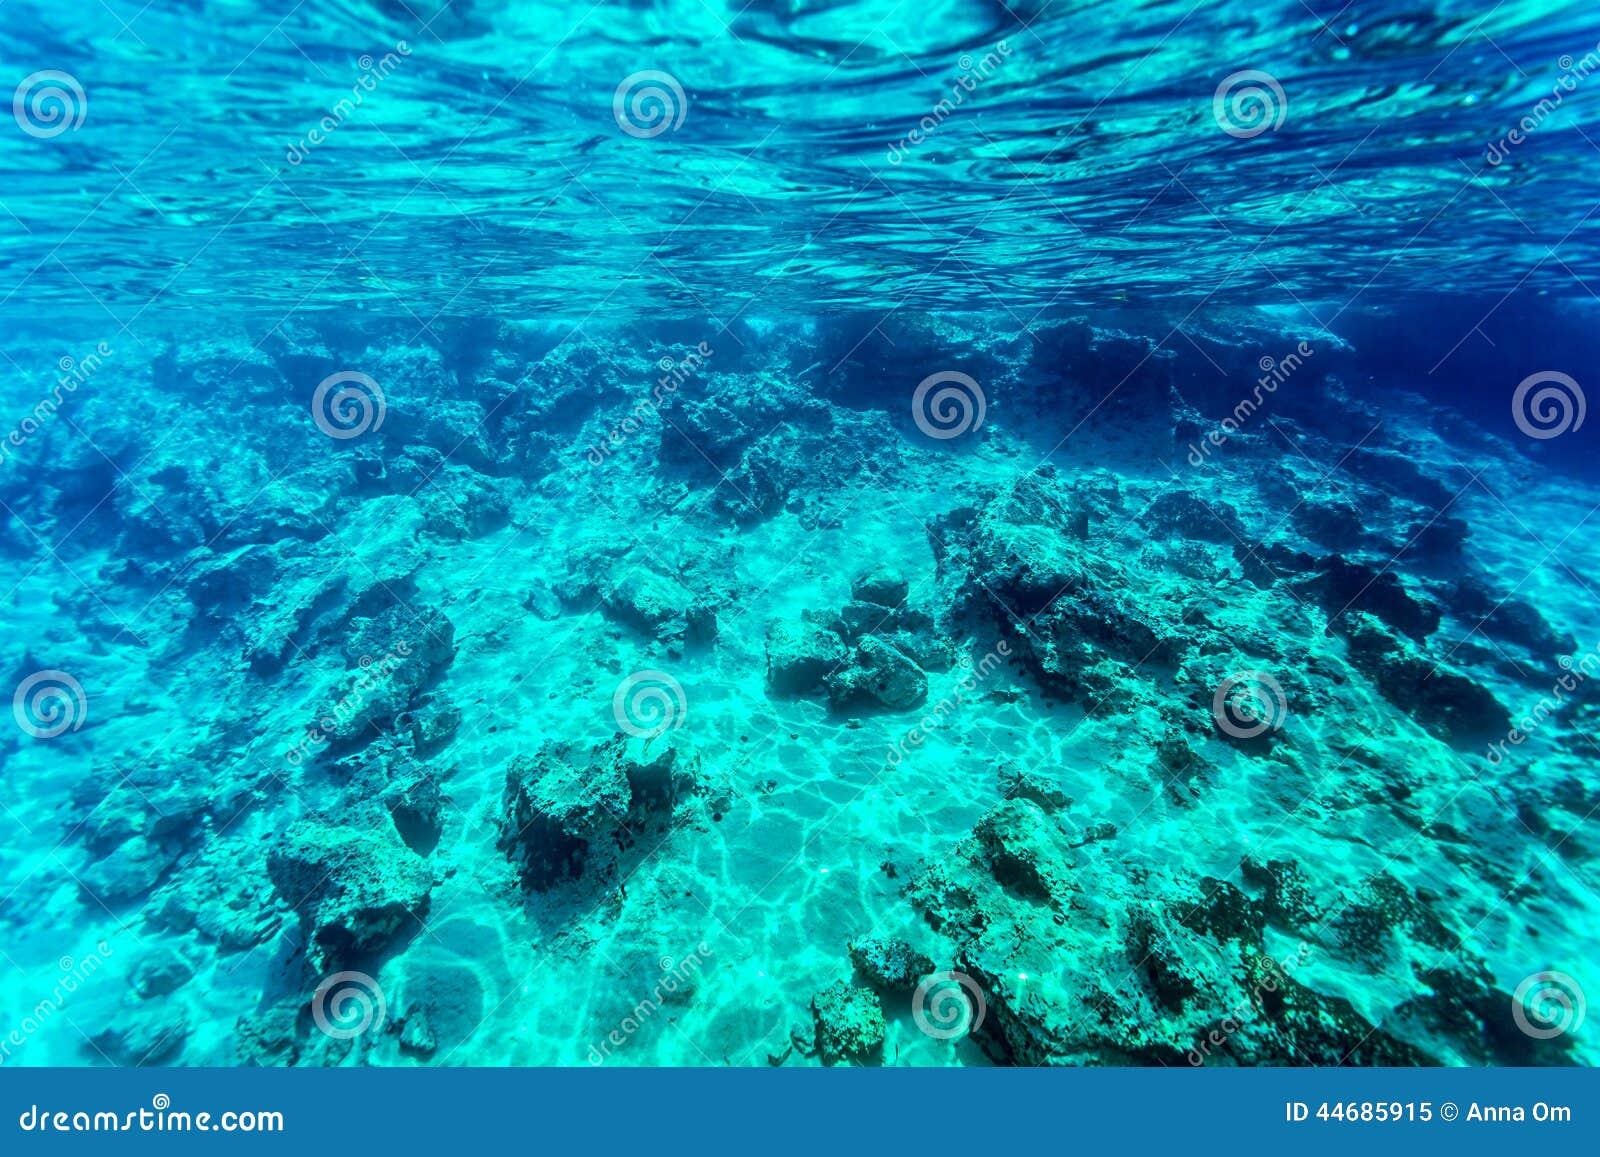 Sea Bottom Of The Sea Fish Seabed Sea: Beautiful Seabed Background Stock Photo